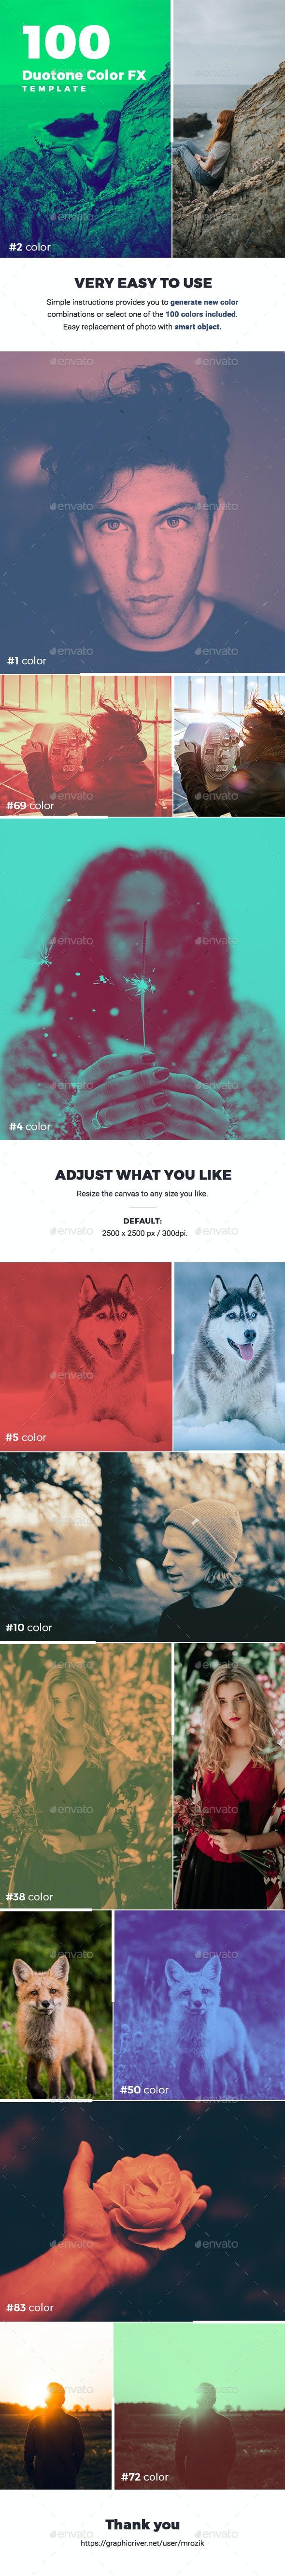 100 Duotone FX Photo Template